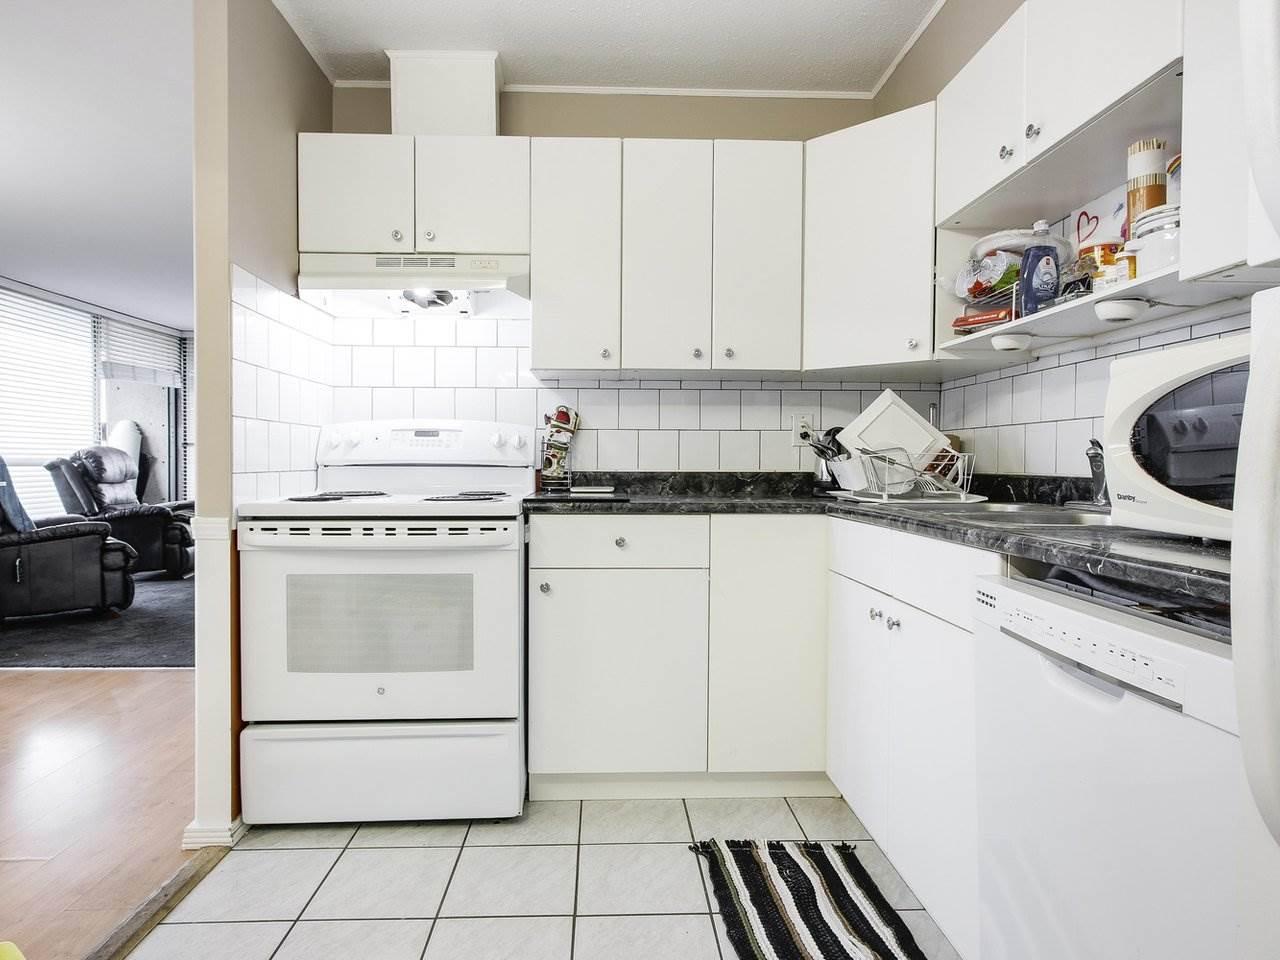 Condo Apartment at 905 3755 BARTLETT COURT, Unit 905, Burnaby North, British Columbia. Image 12